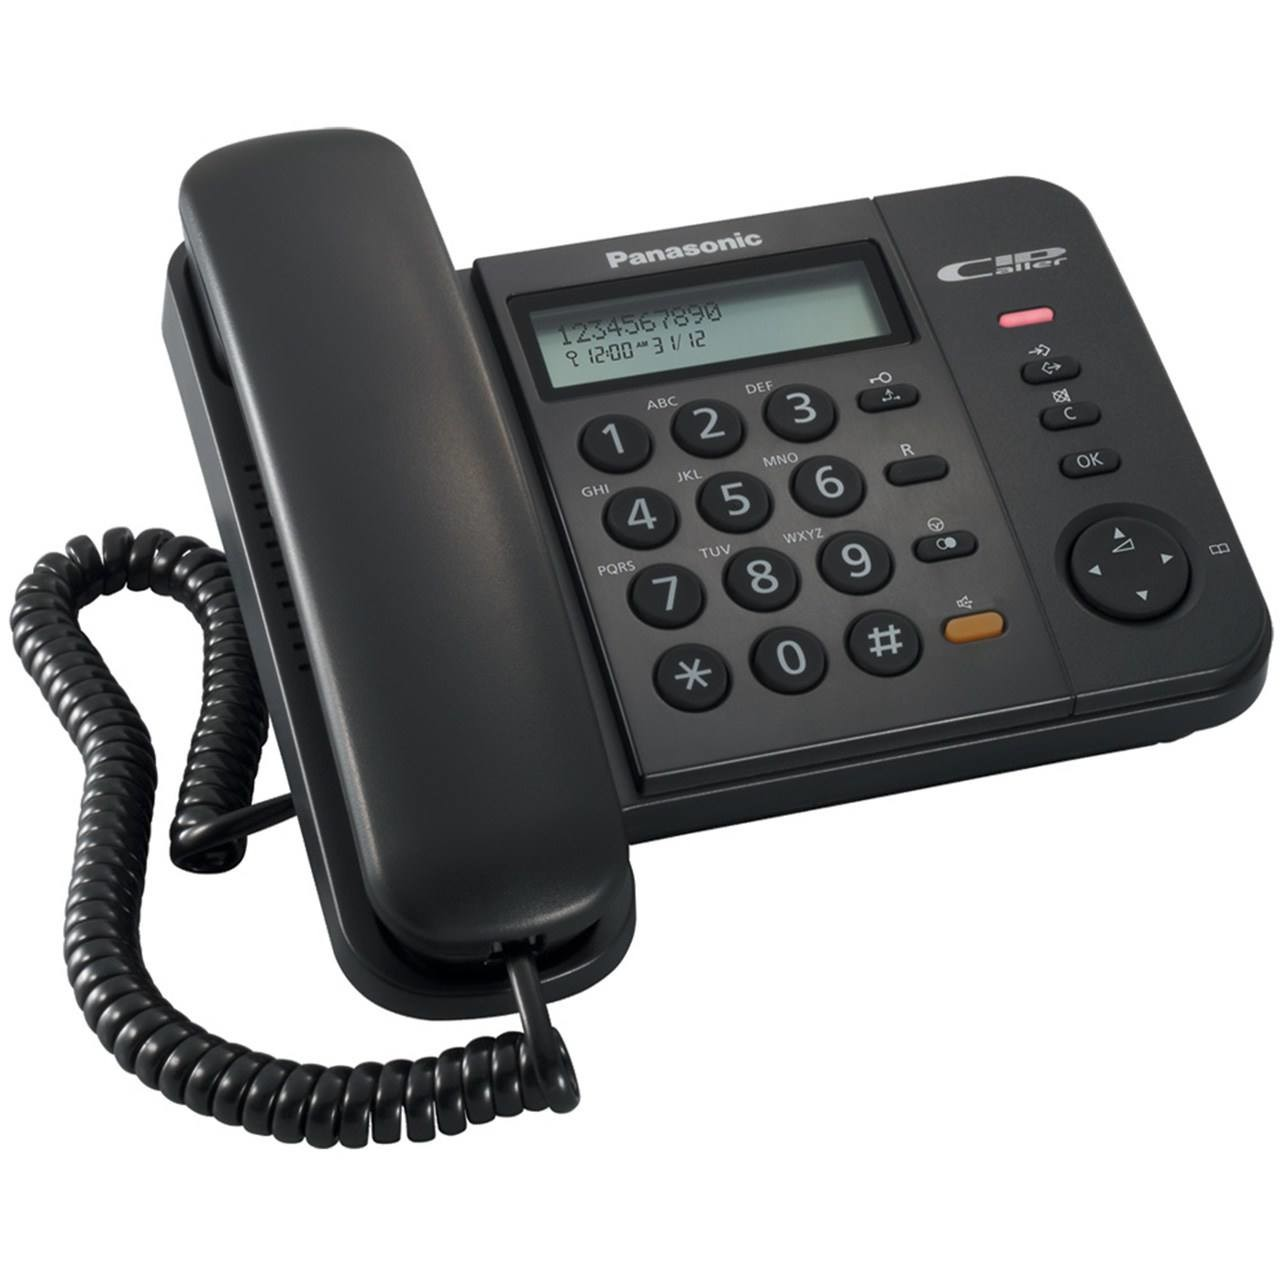 main images تلفن دیجیتال با سیم پاناسونیک مدل تی اس 580 ام ایکس Panasonic Digital Corded Phone - KX-TS580MX